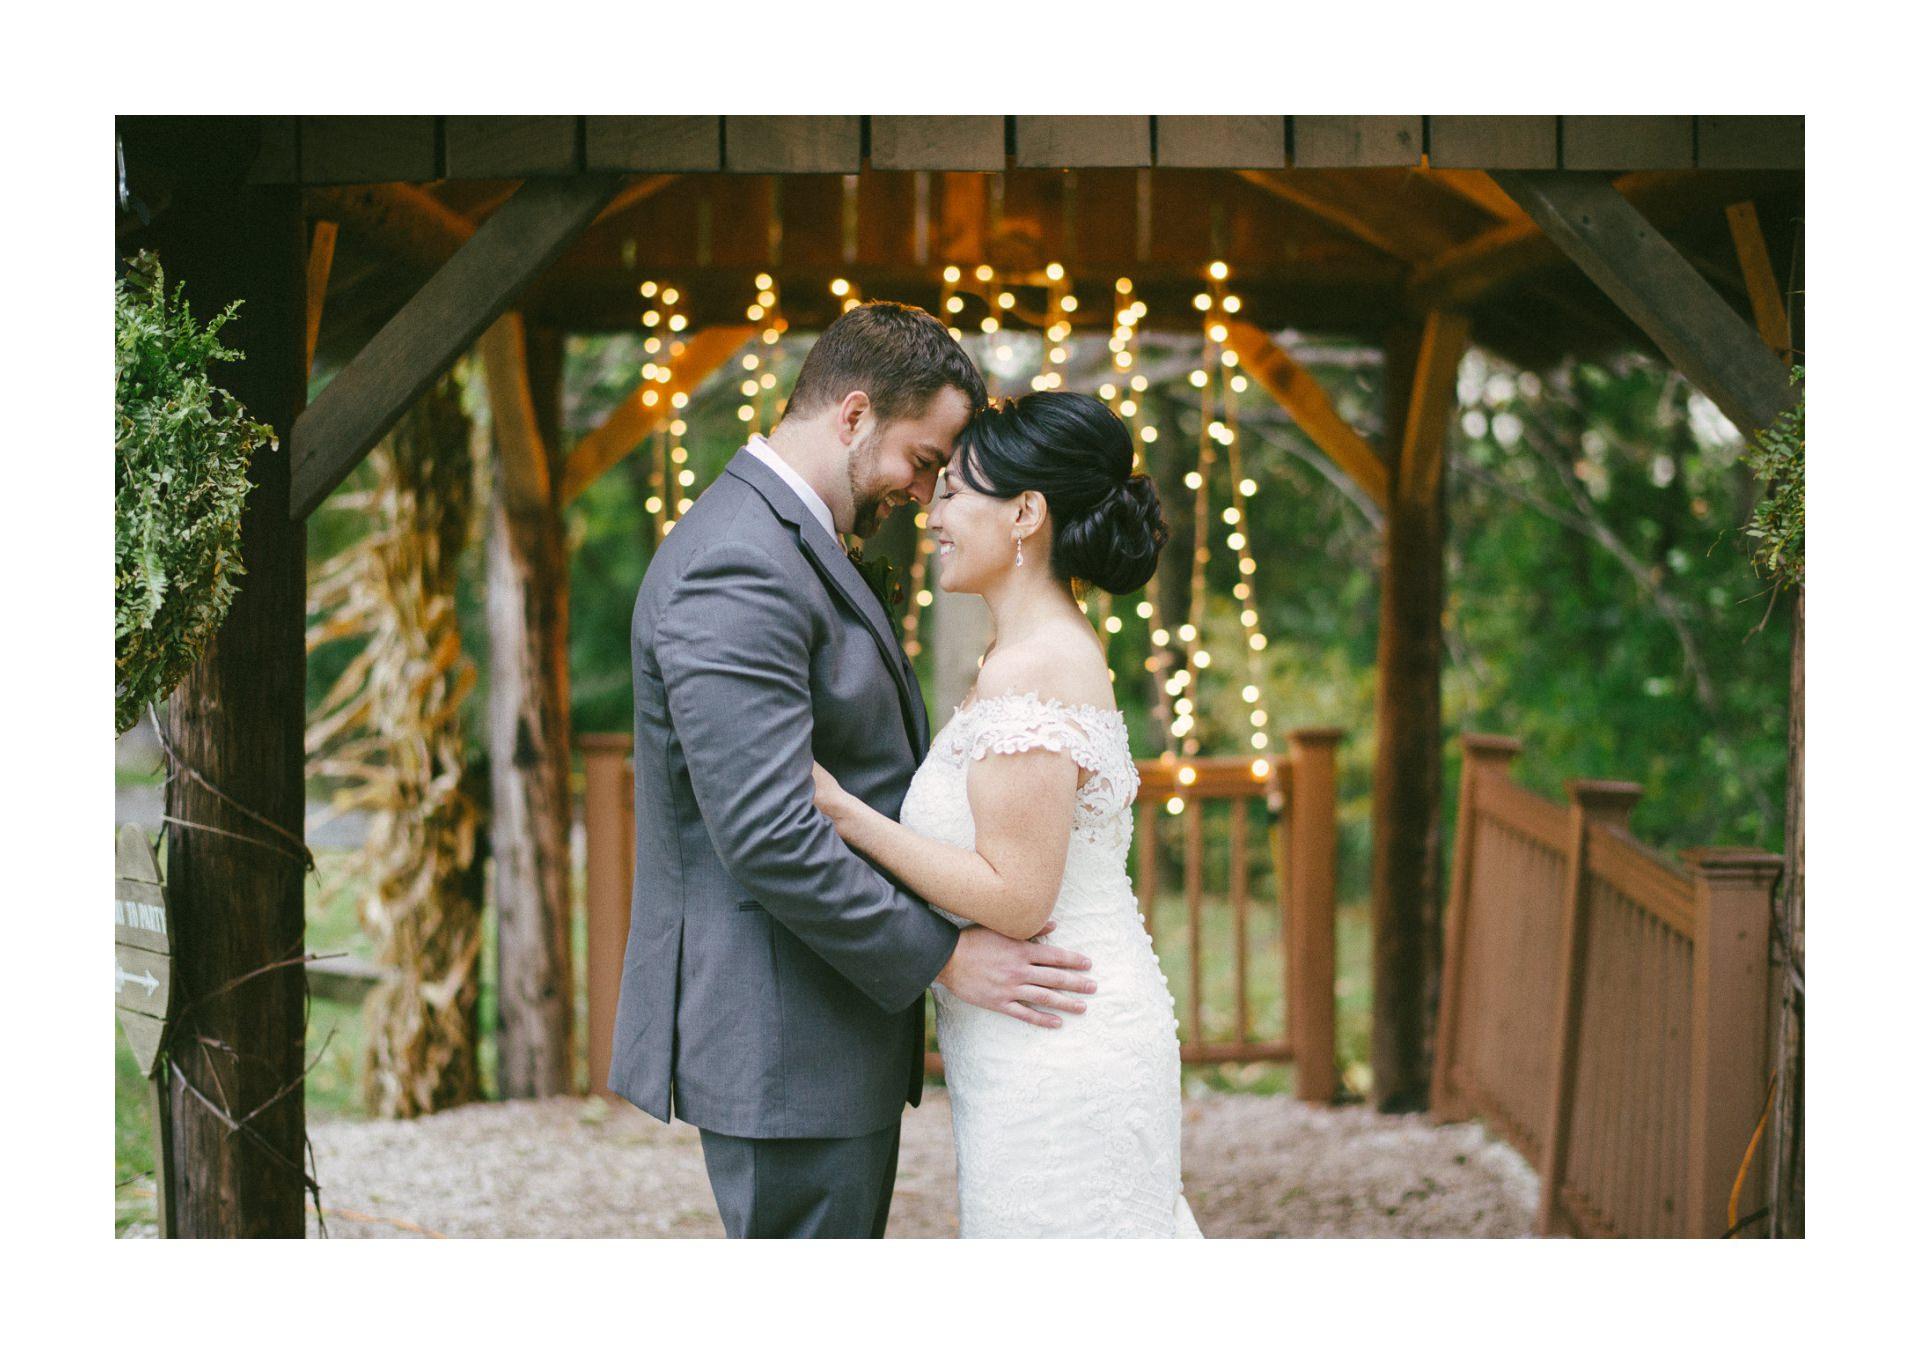 Patterson Fruit Farm Wedding Photographer in Cleveland 1 43.jpg